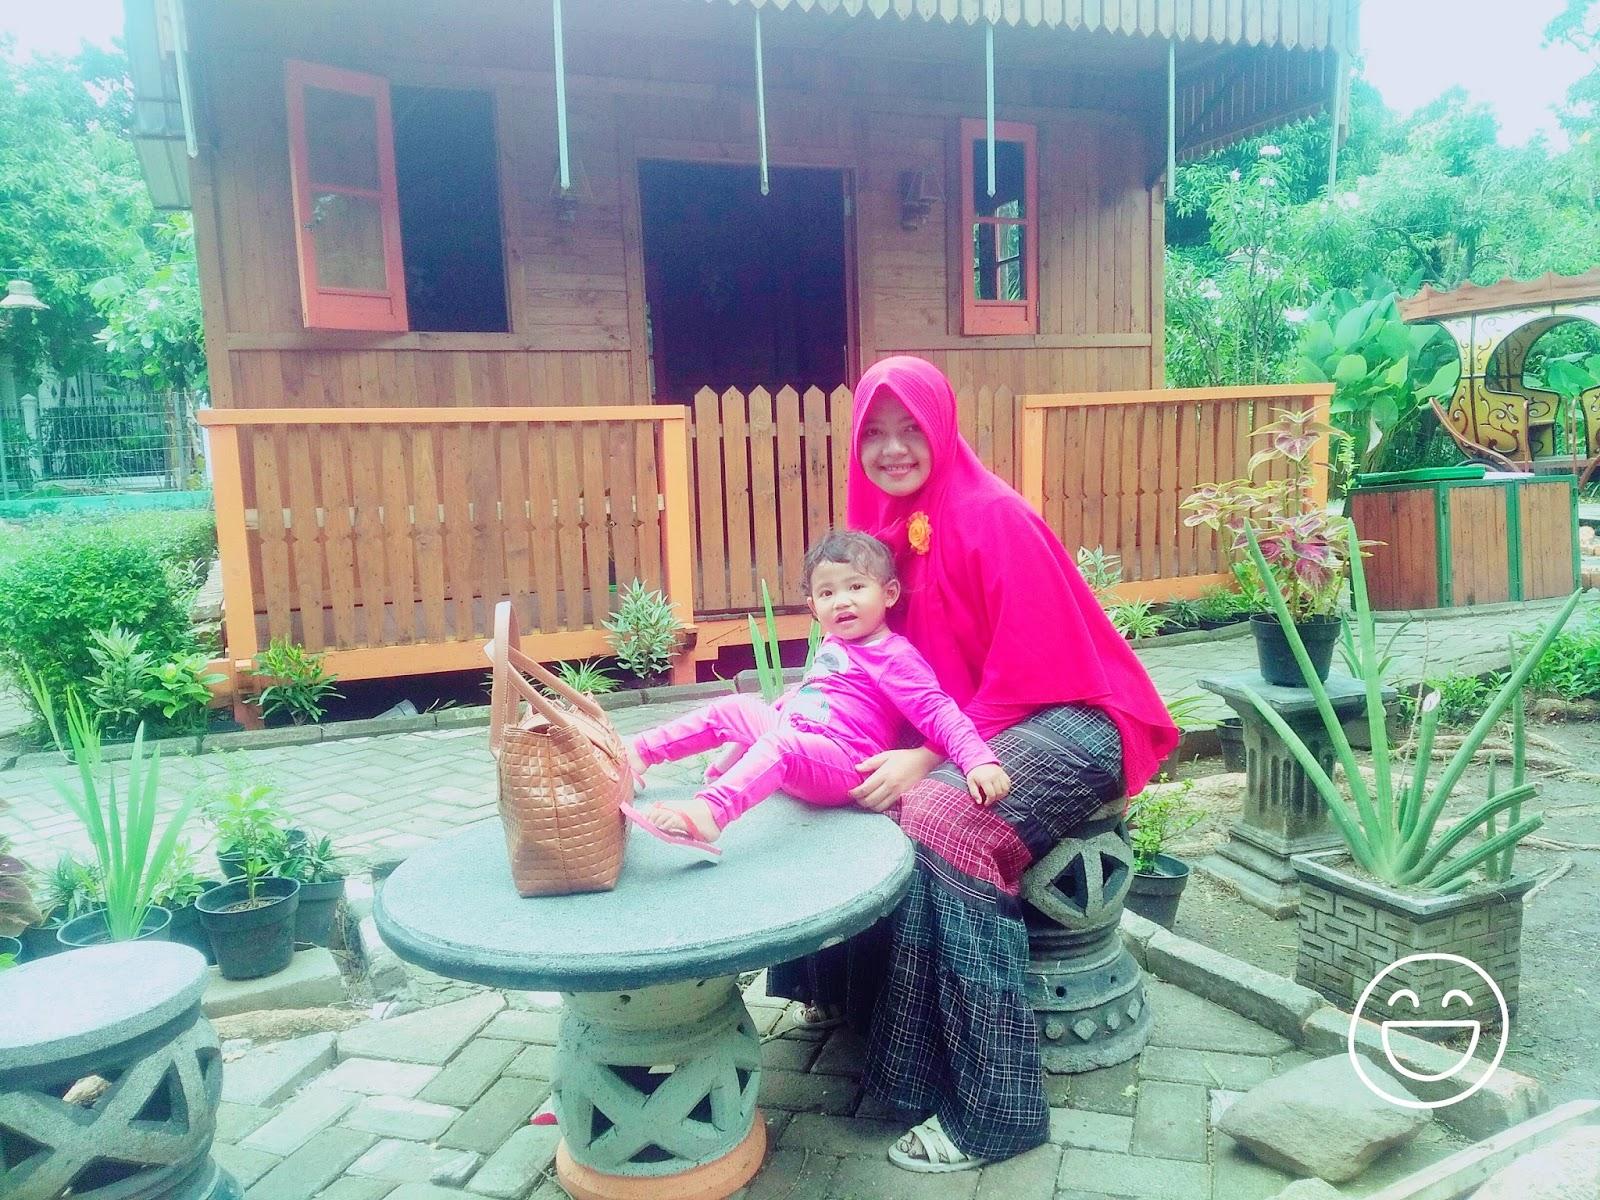 Wisata Keluarga Sidoarjo Taman Abhirama Haya Zone Salah Satu Rumah